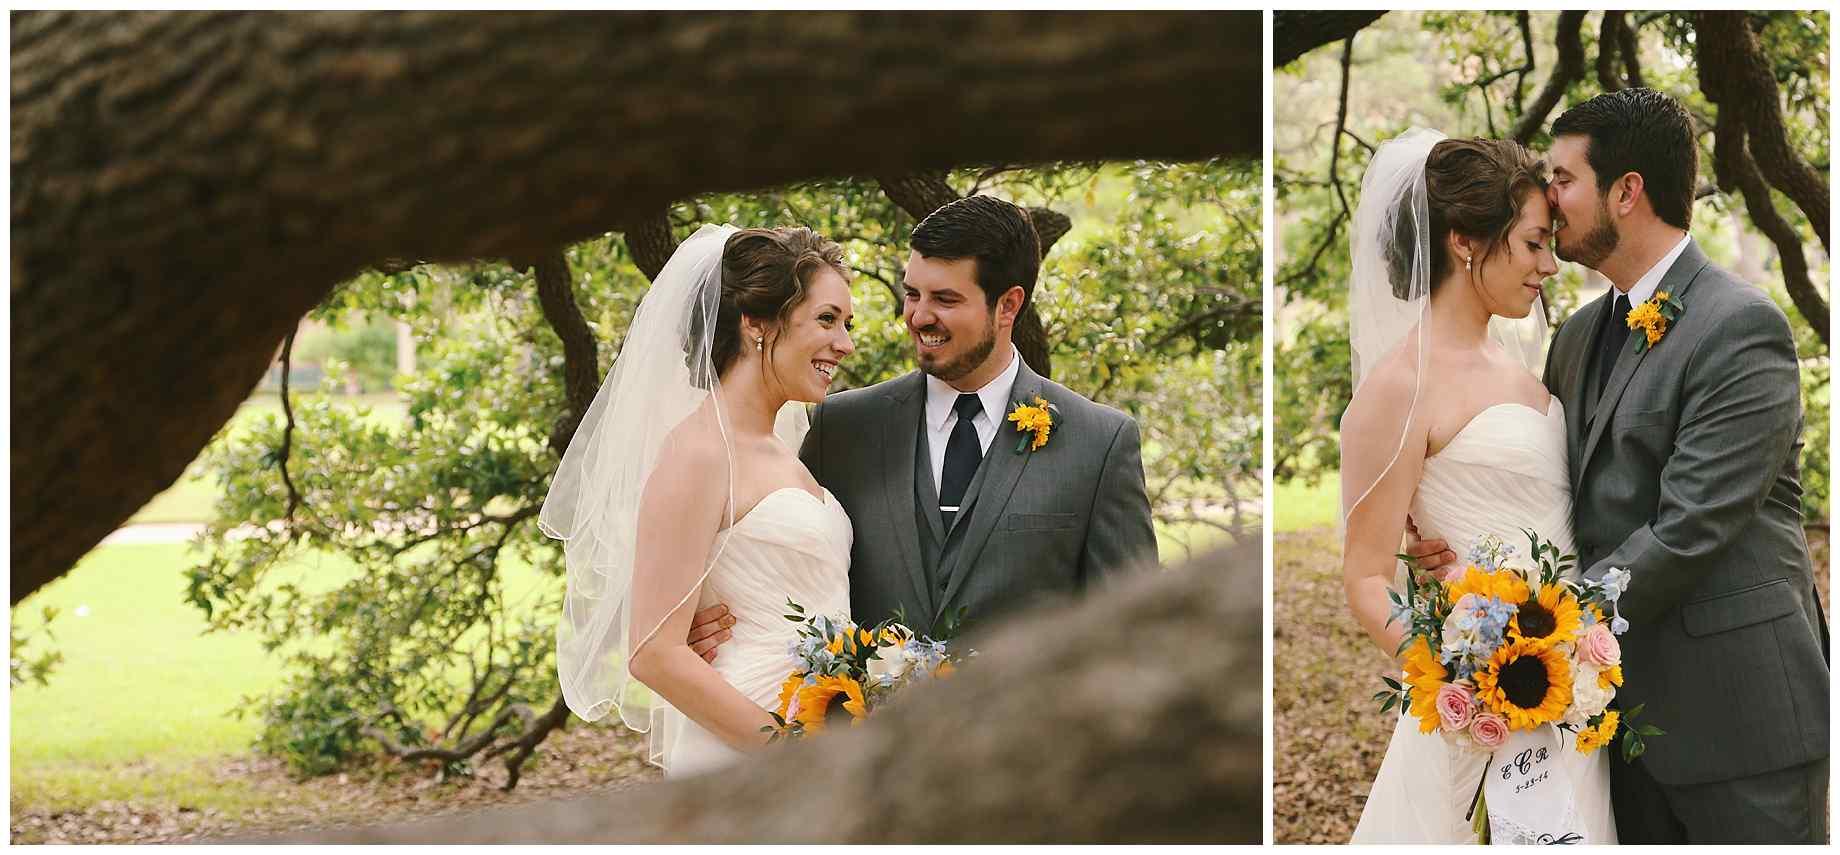 aggie-century-tree-wedding-25